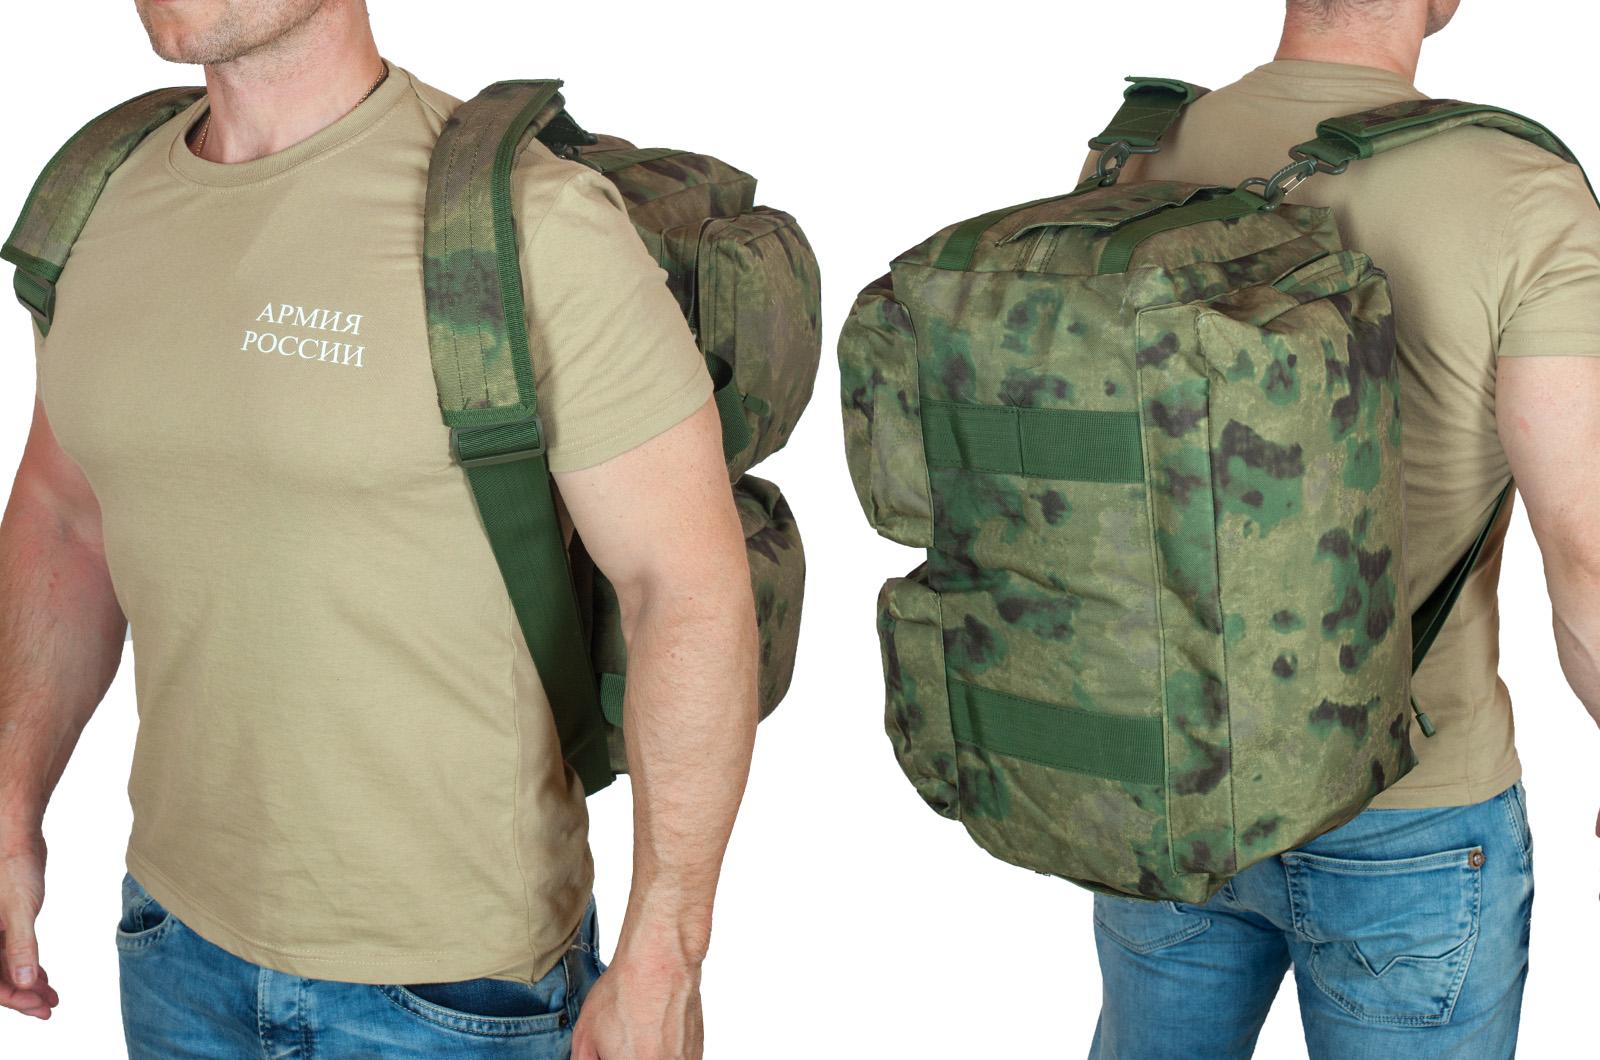 Камуфляжная дорожная сумка - заказать онлайн